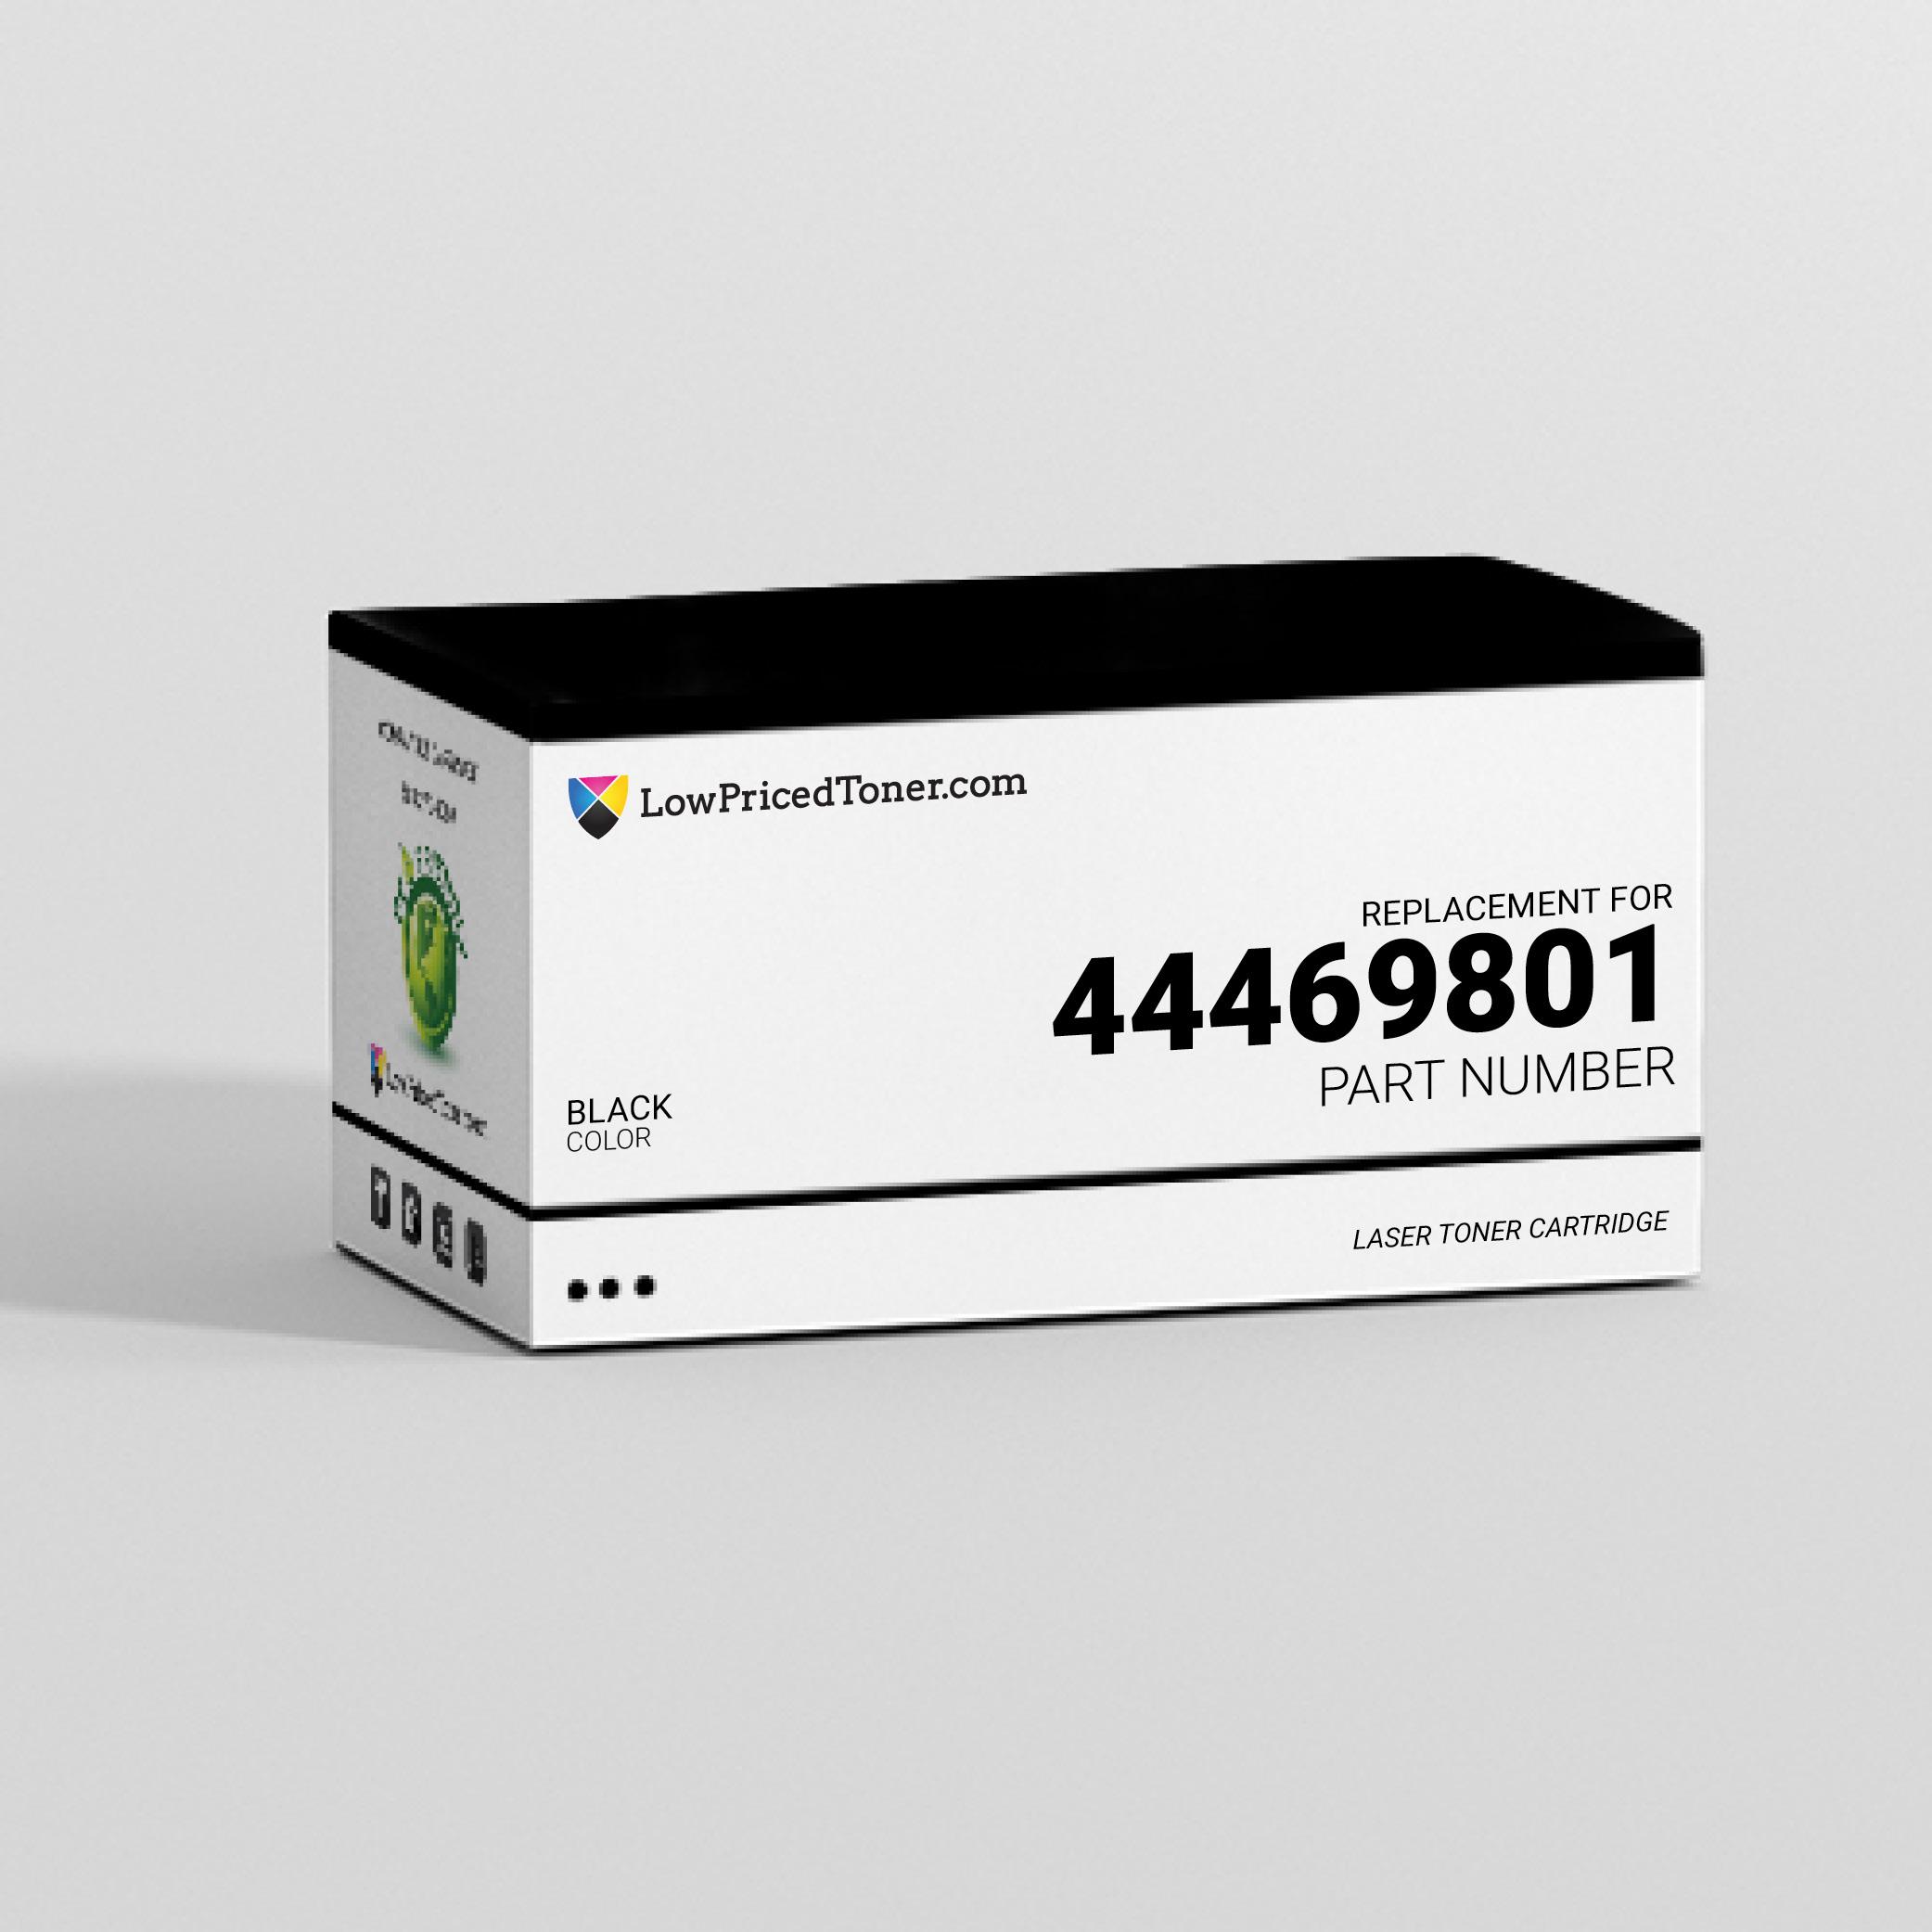 Okidata 44469801 Compatible Black Laser Toner Cartridge